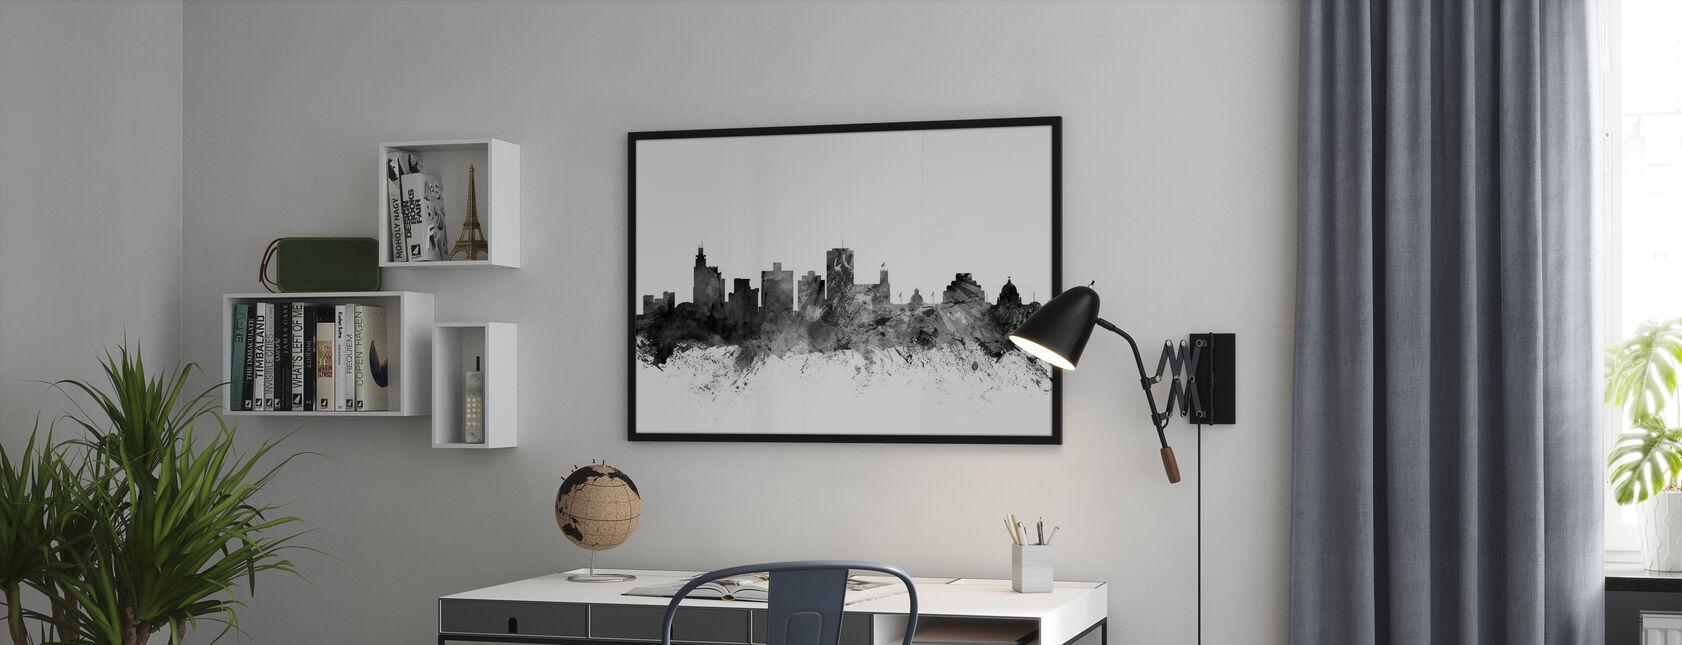 Jackson Mississippi Skyline Black - Poster - Office